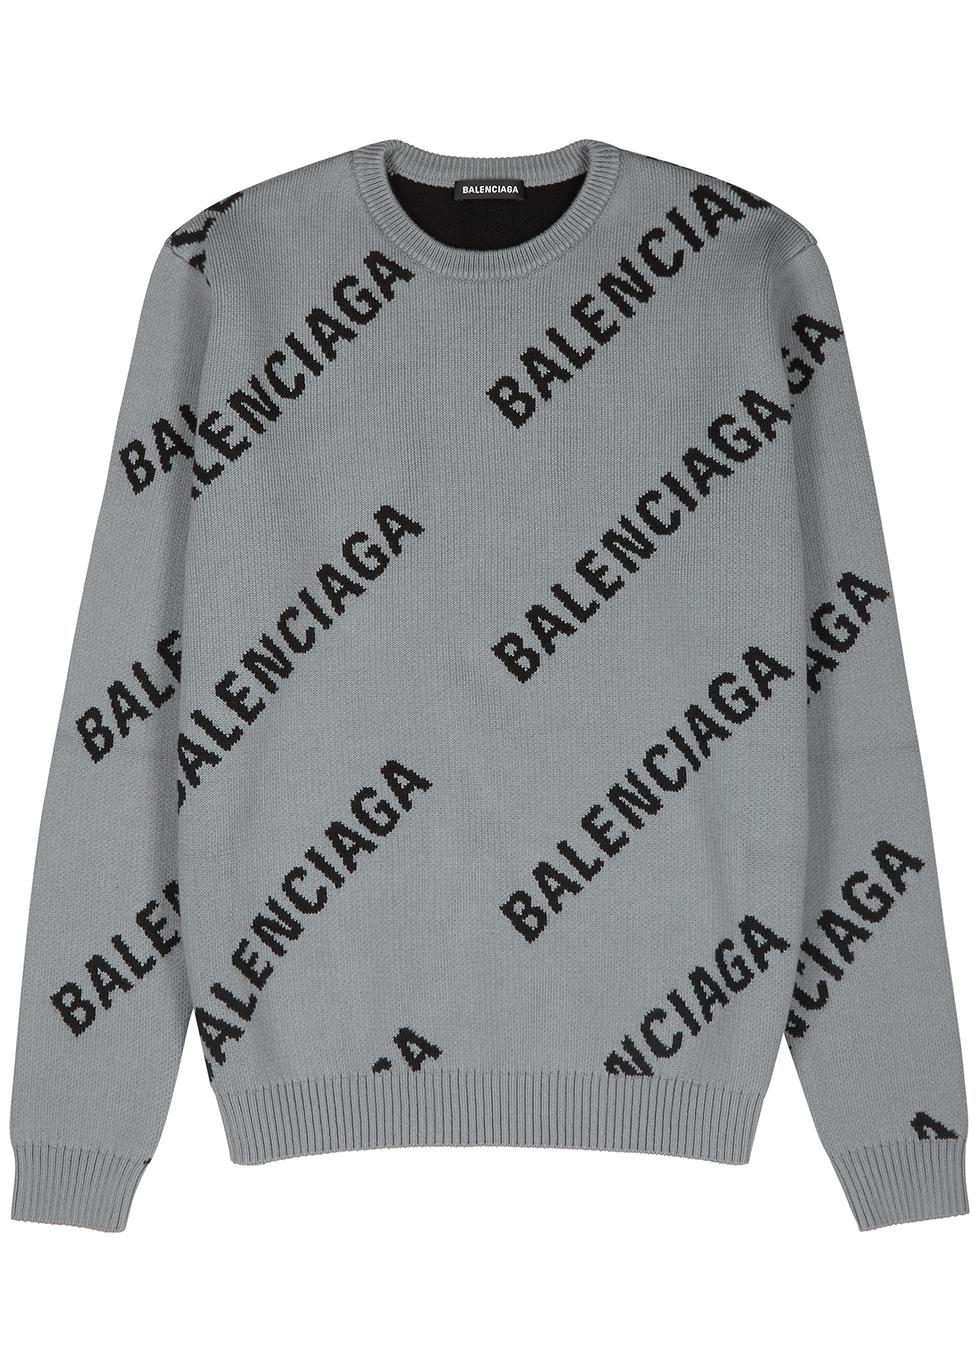 7bafbf9656c58 New In Men's Designer Clothing and Fashion - Harvey Nichols